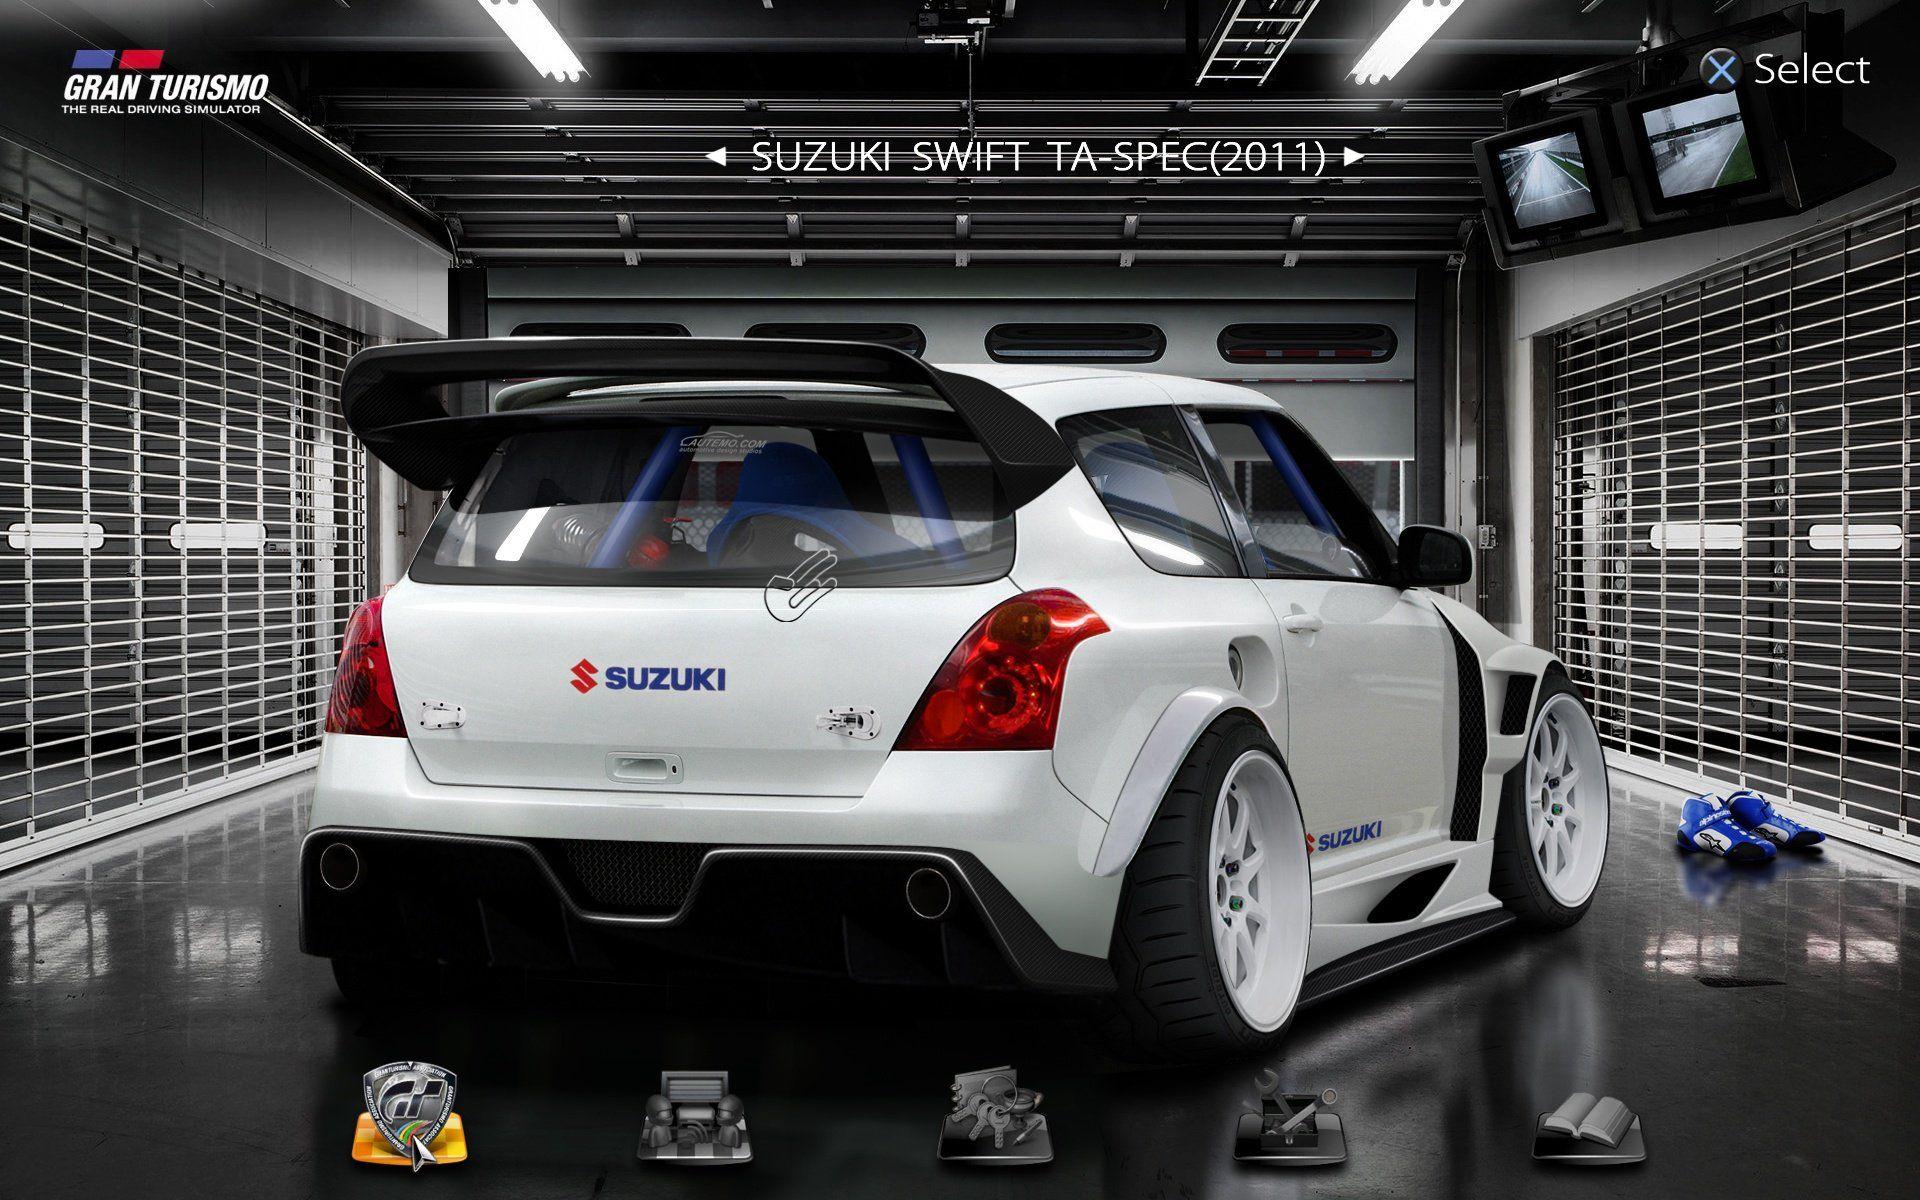 Best Tuner Cars >> Dc Modified Car 2017 2018 Best Cars Reviews | Suzuki swift ...